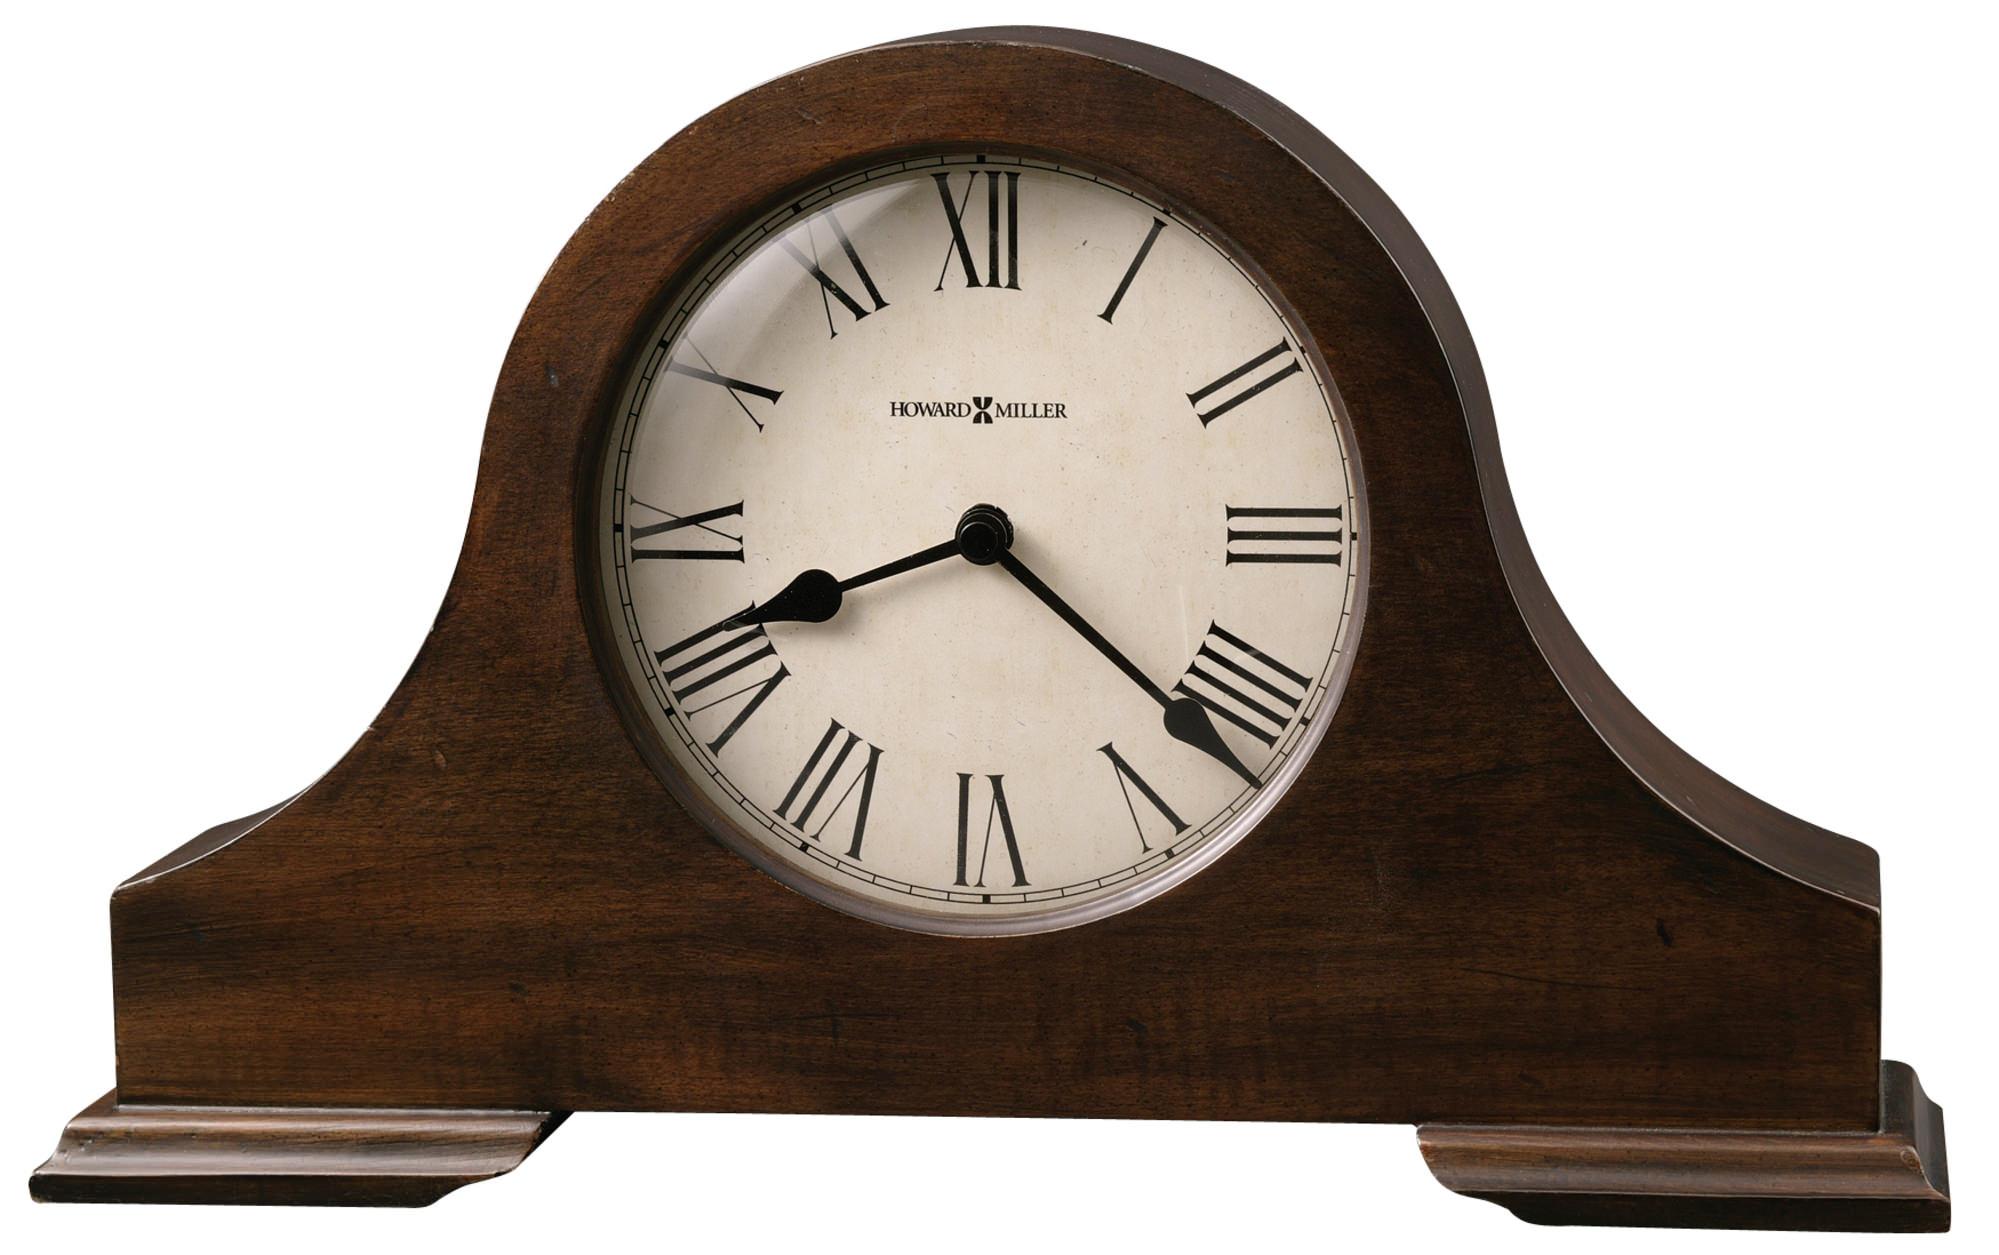 635-143 Humphrey Mantel Clock by Howard Miller